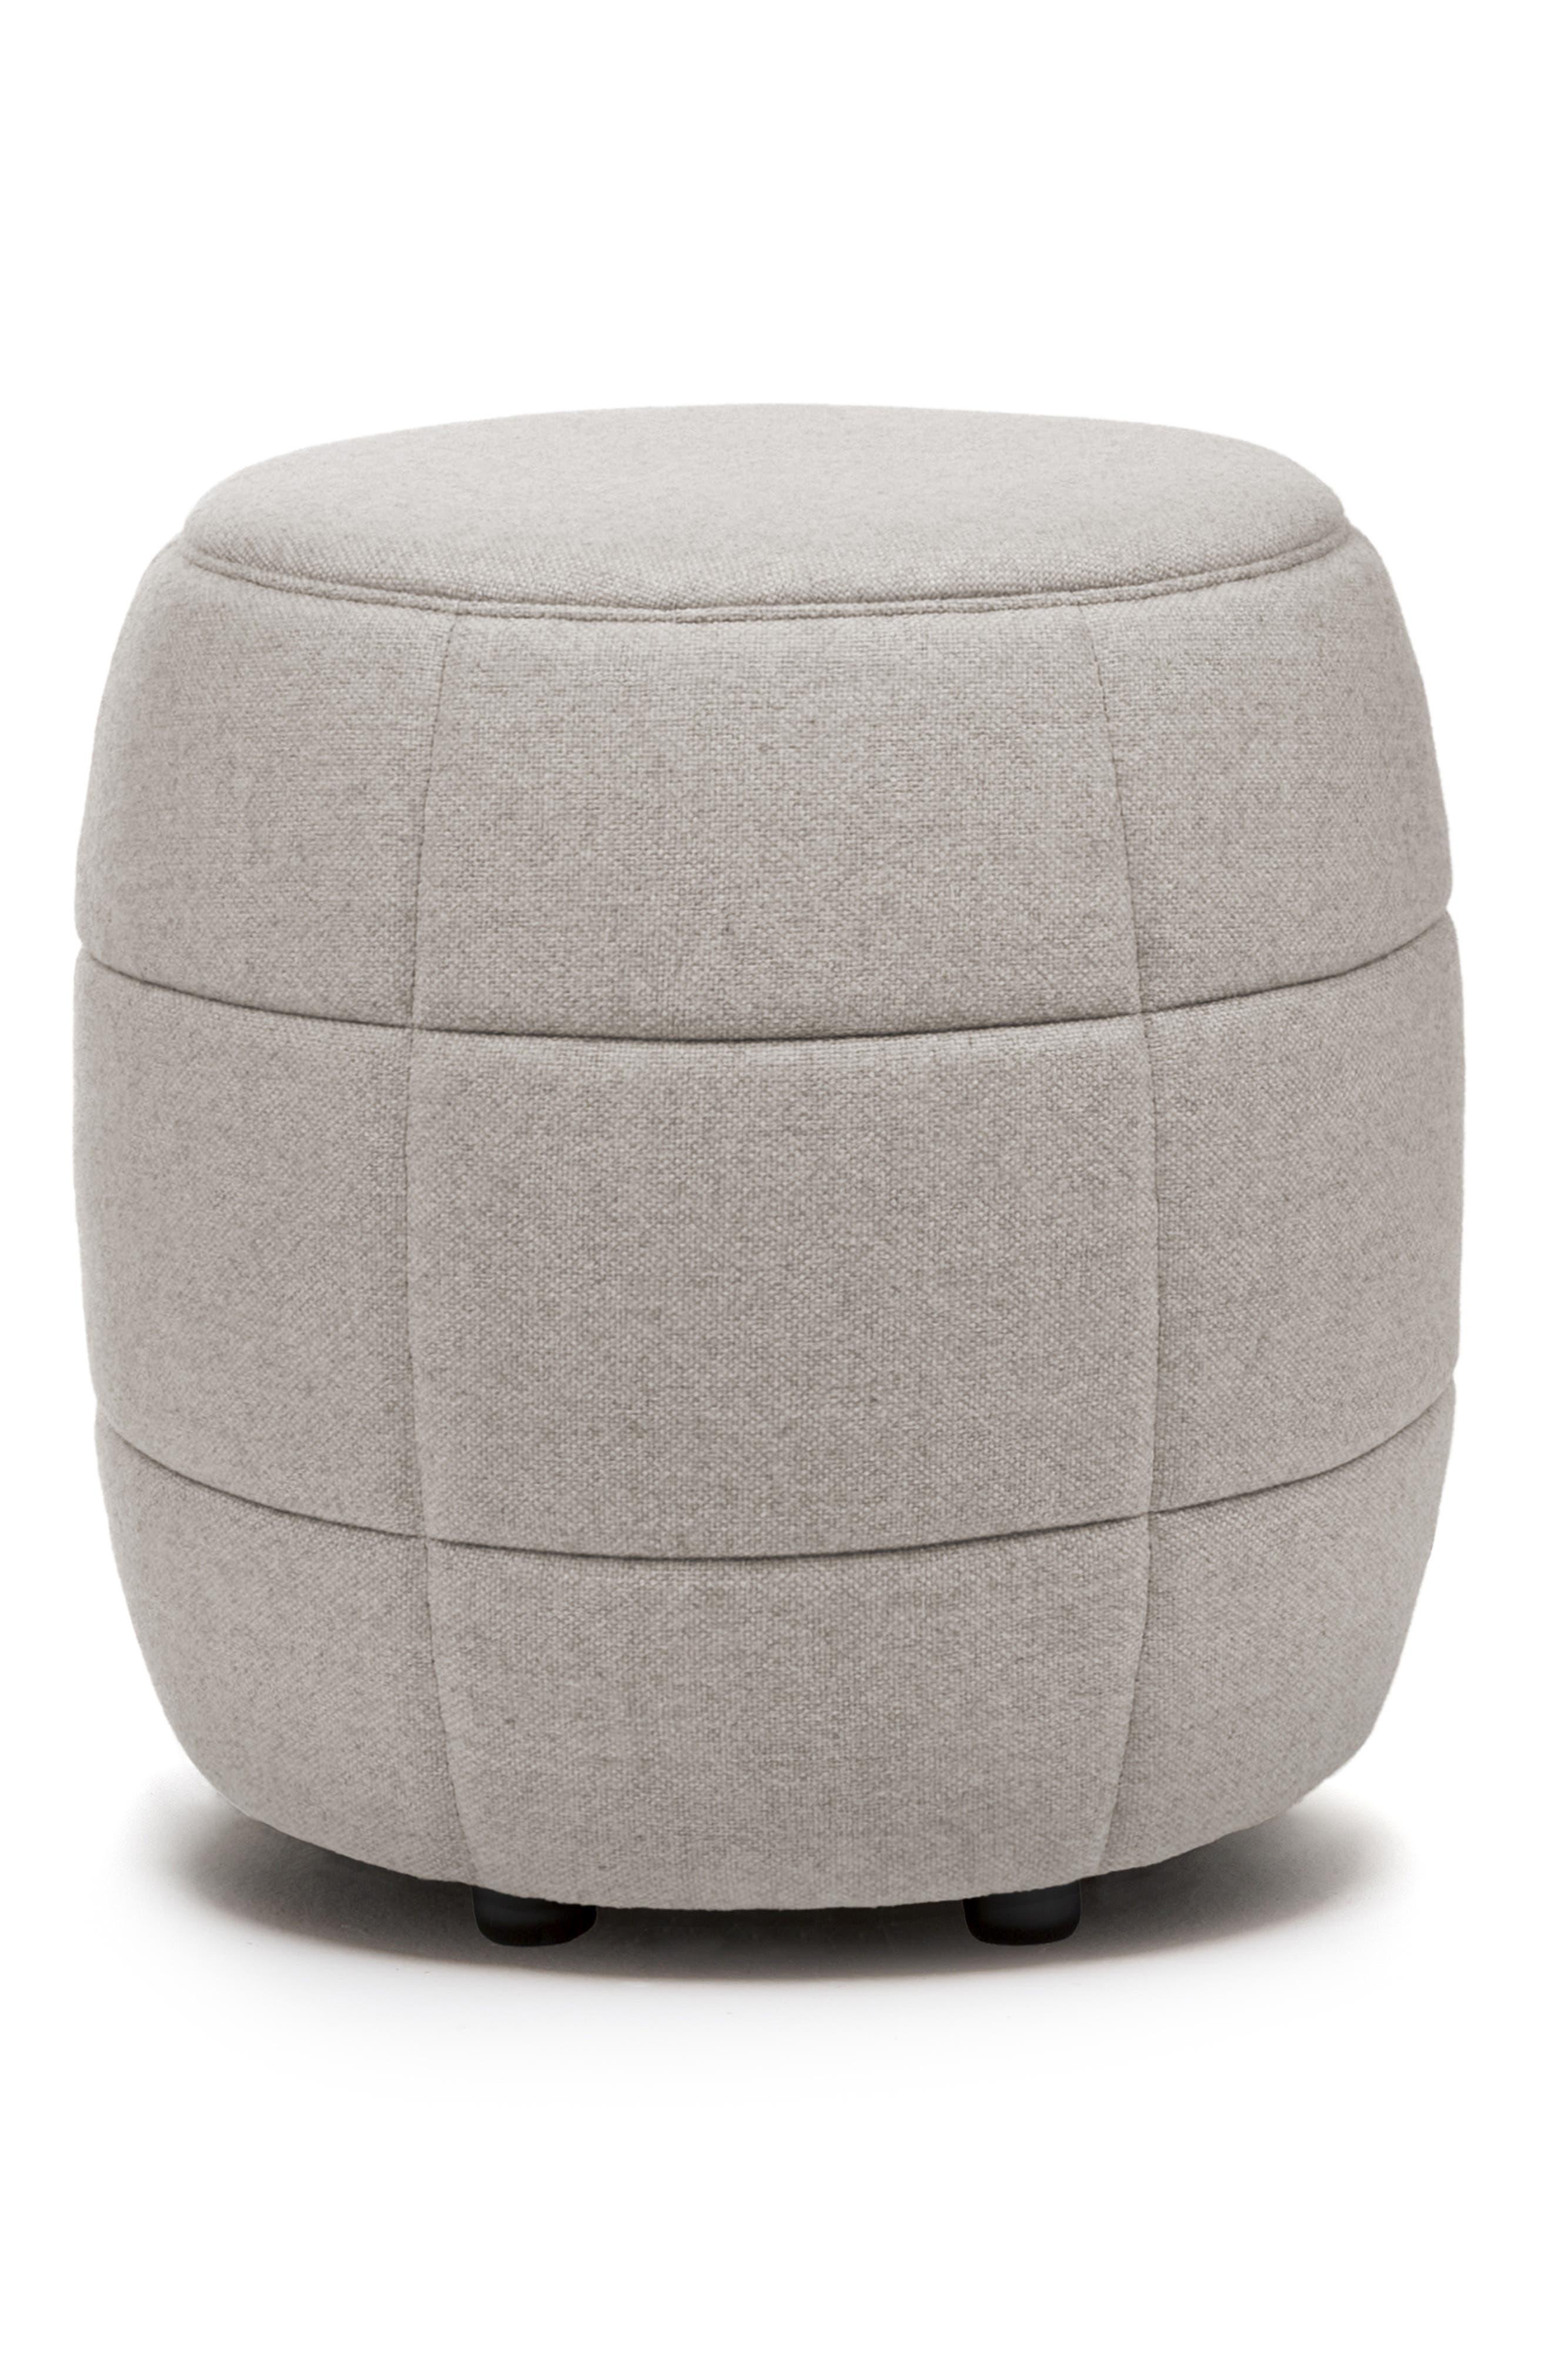 Main Image - Design on Stock USA Barrell - Ploegwool Wool Stool